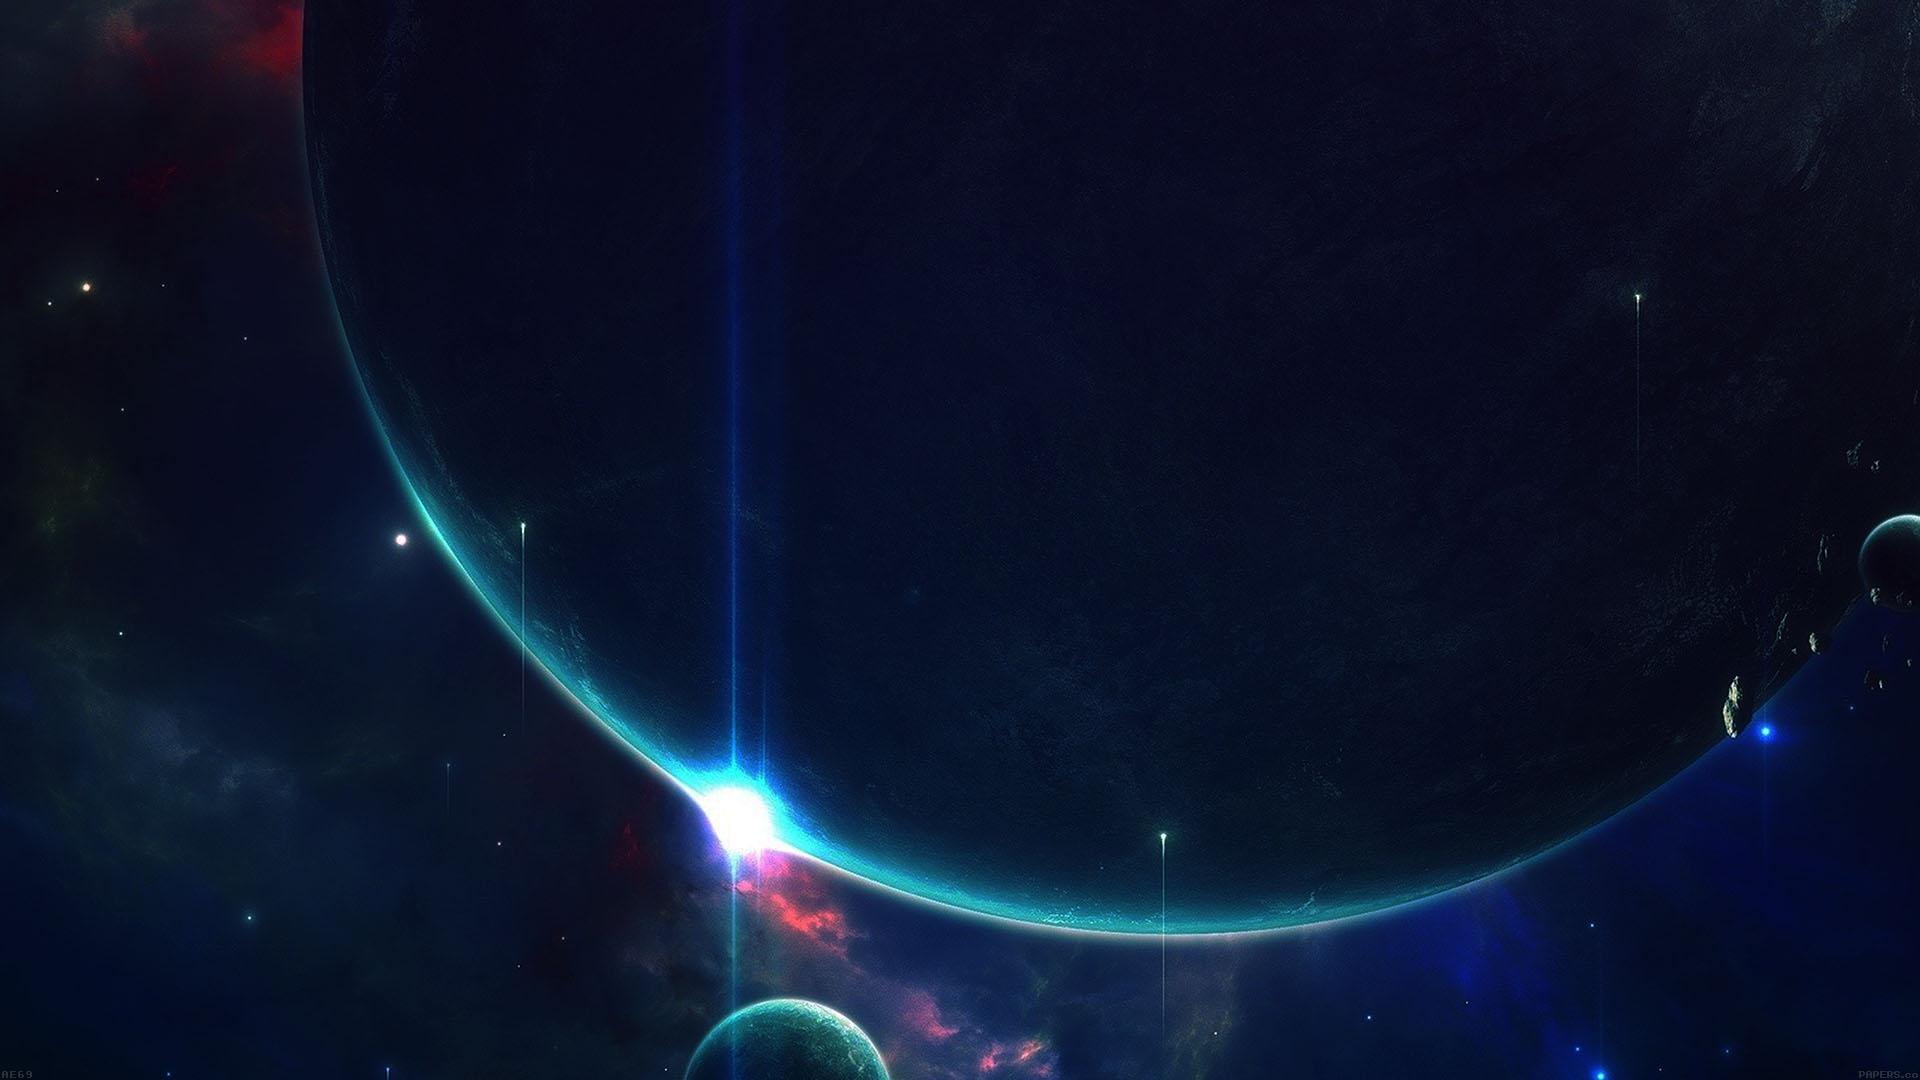 Black Hole Centaurus A